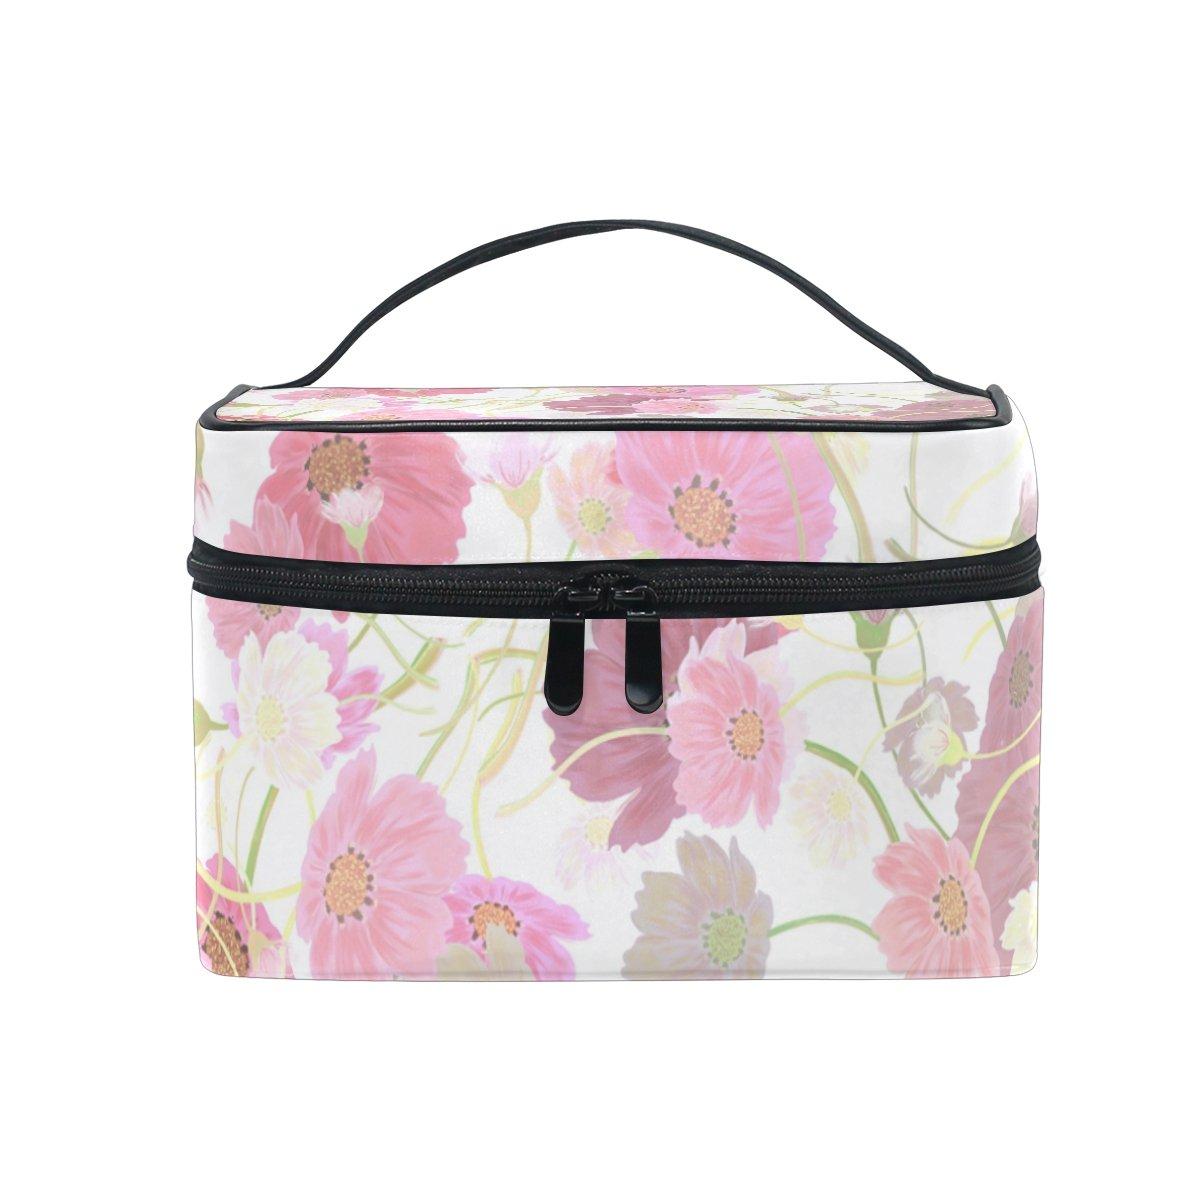 SAVSV Pink Flowers Cosmetic Bag Toiletry Bags Travel Makeup Large Organizer Portable Multifunction Case for Women Girls